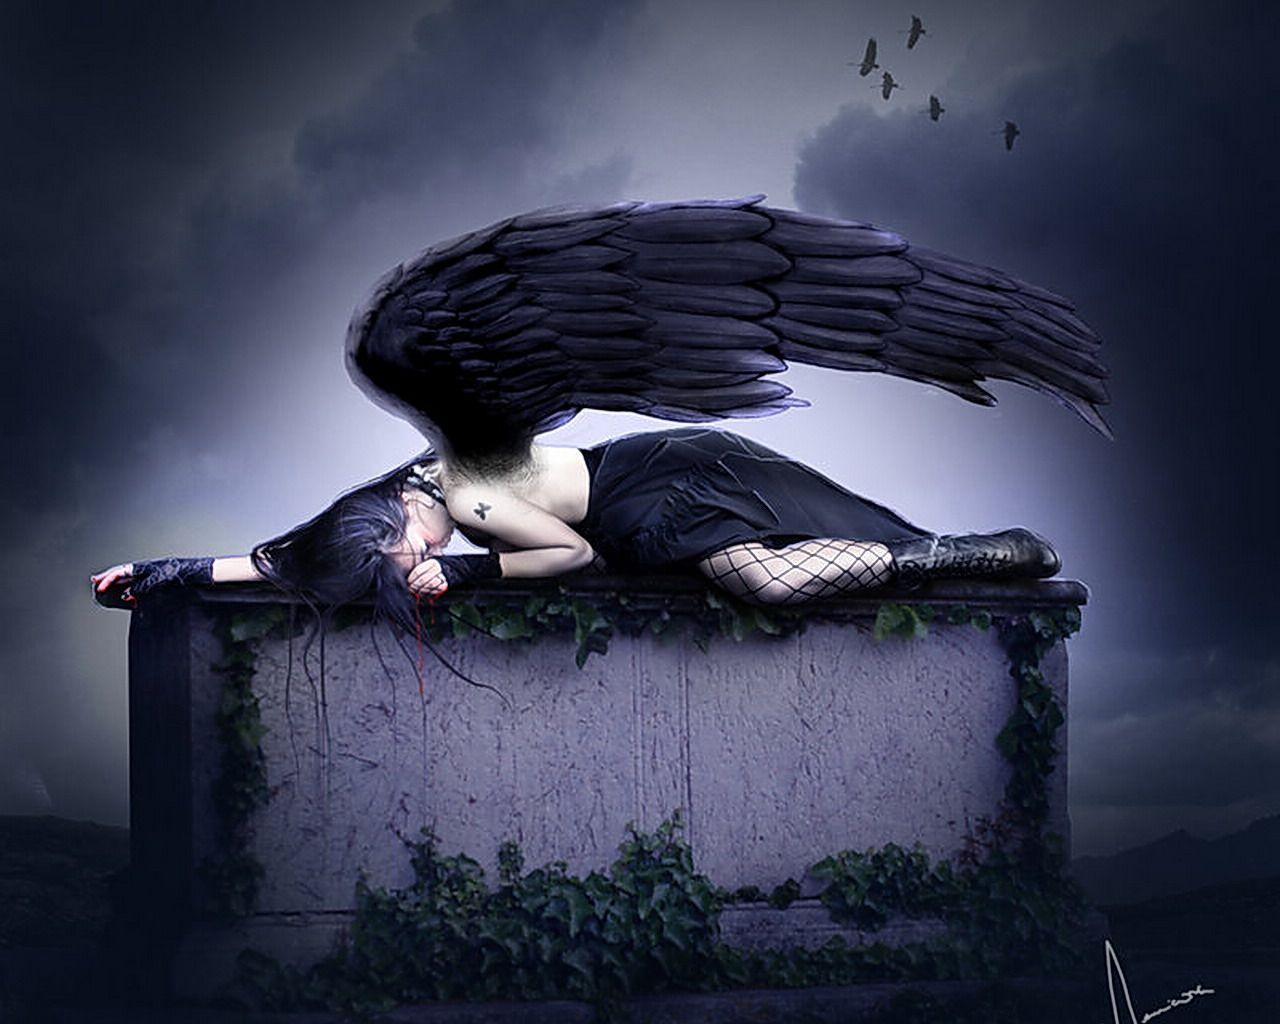 Sleeping Dark Angel wallpaper from Angels wallpapers